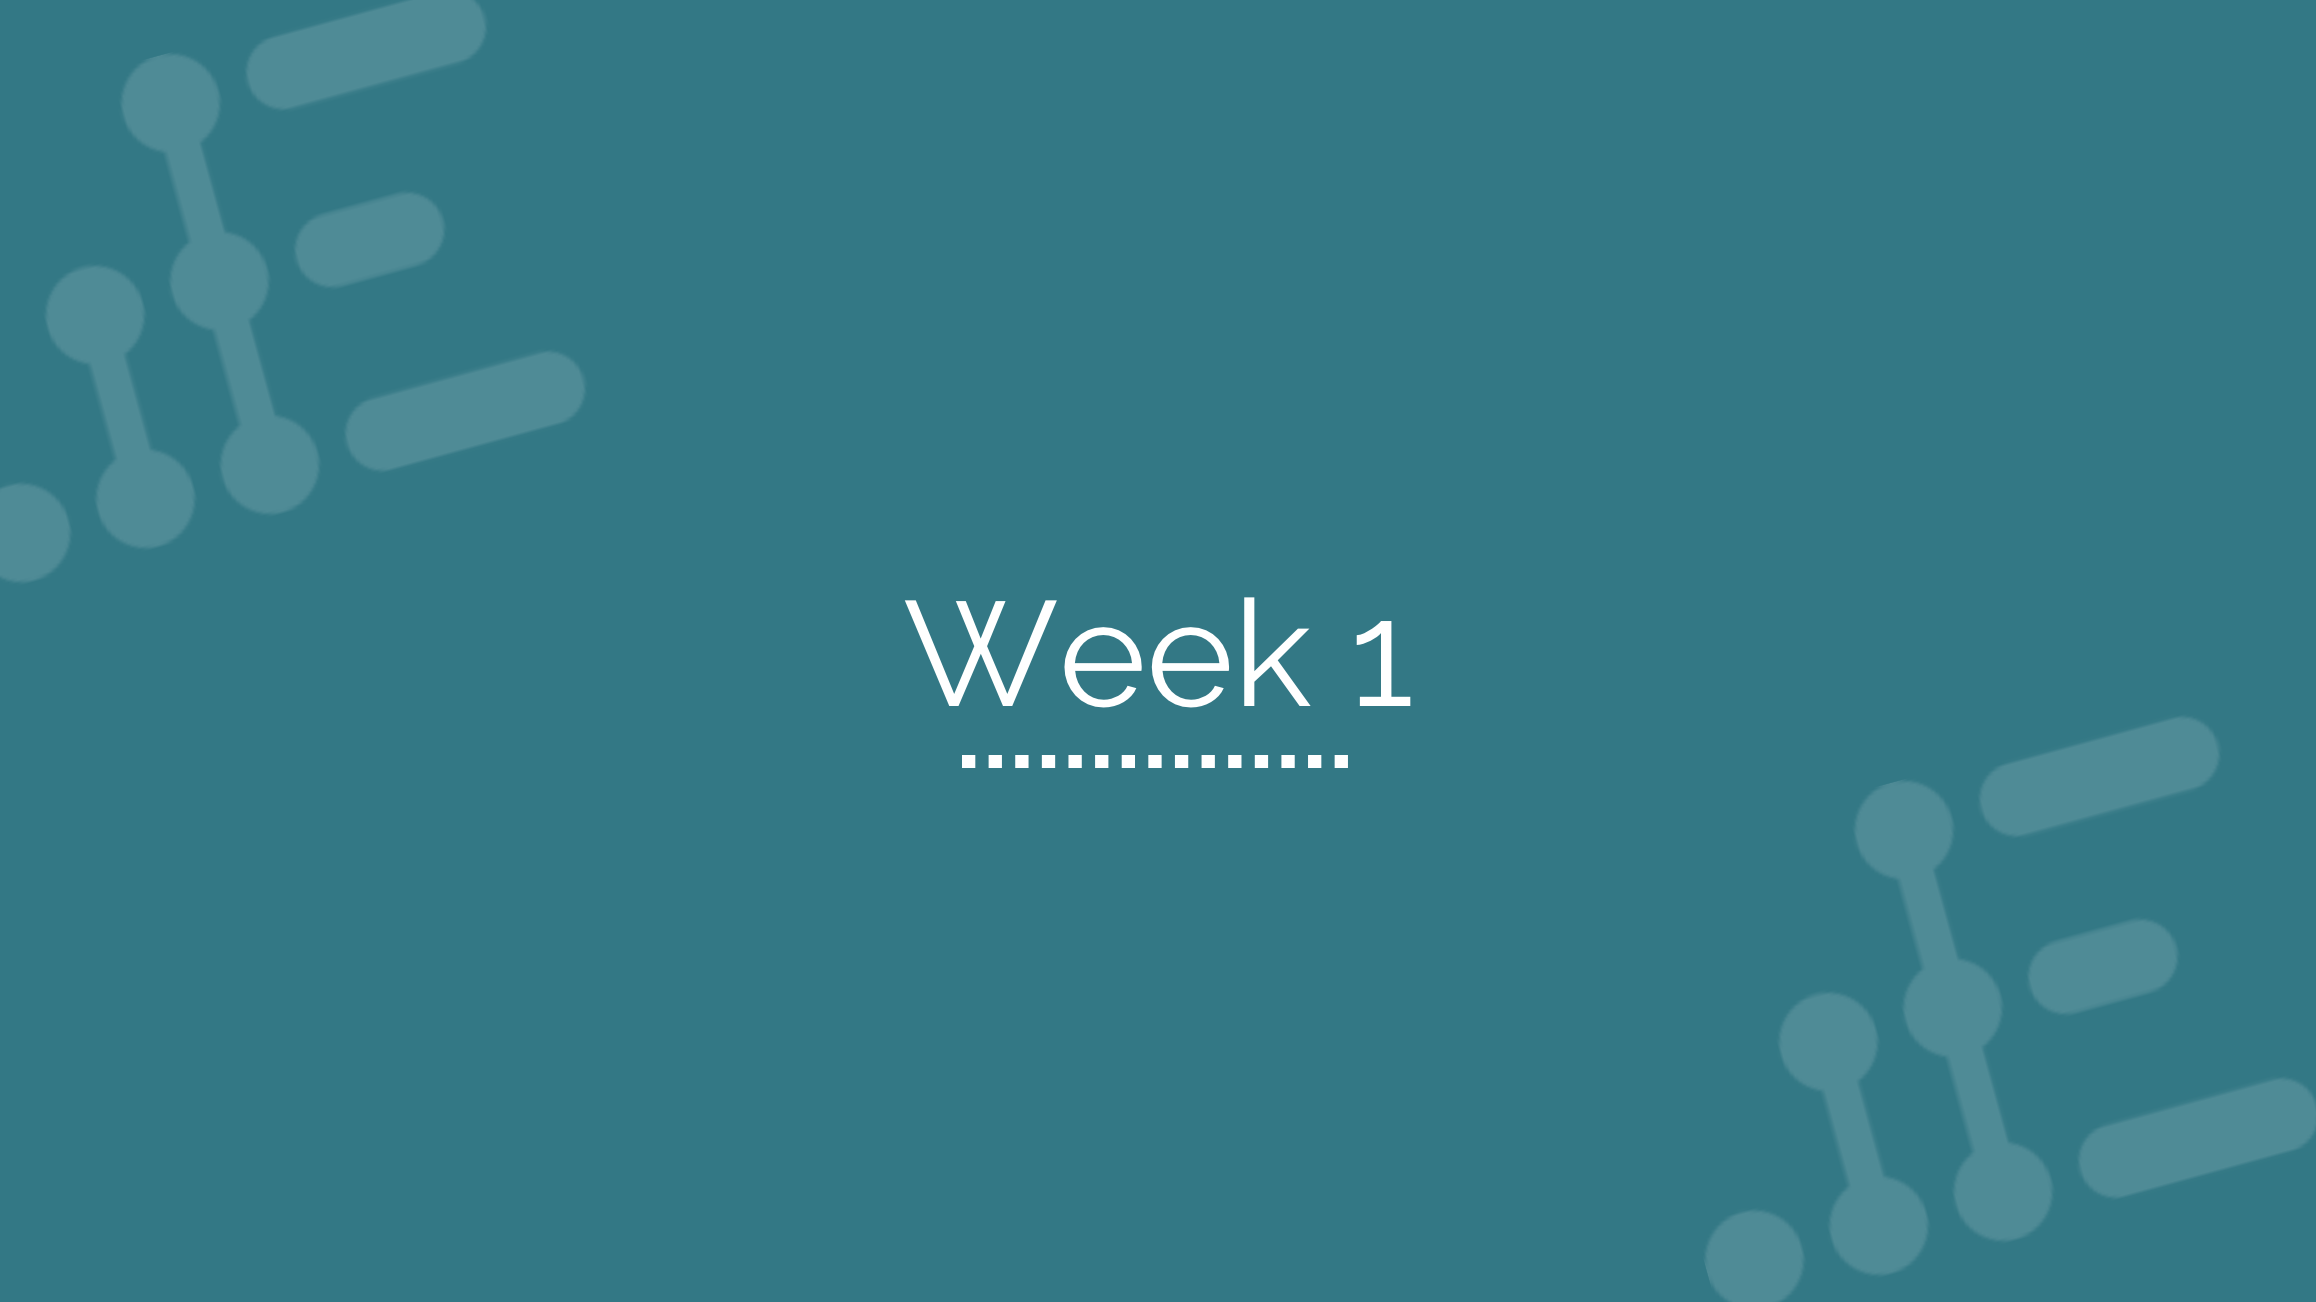 Week 1 - Engagio & ABM